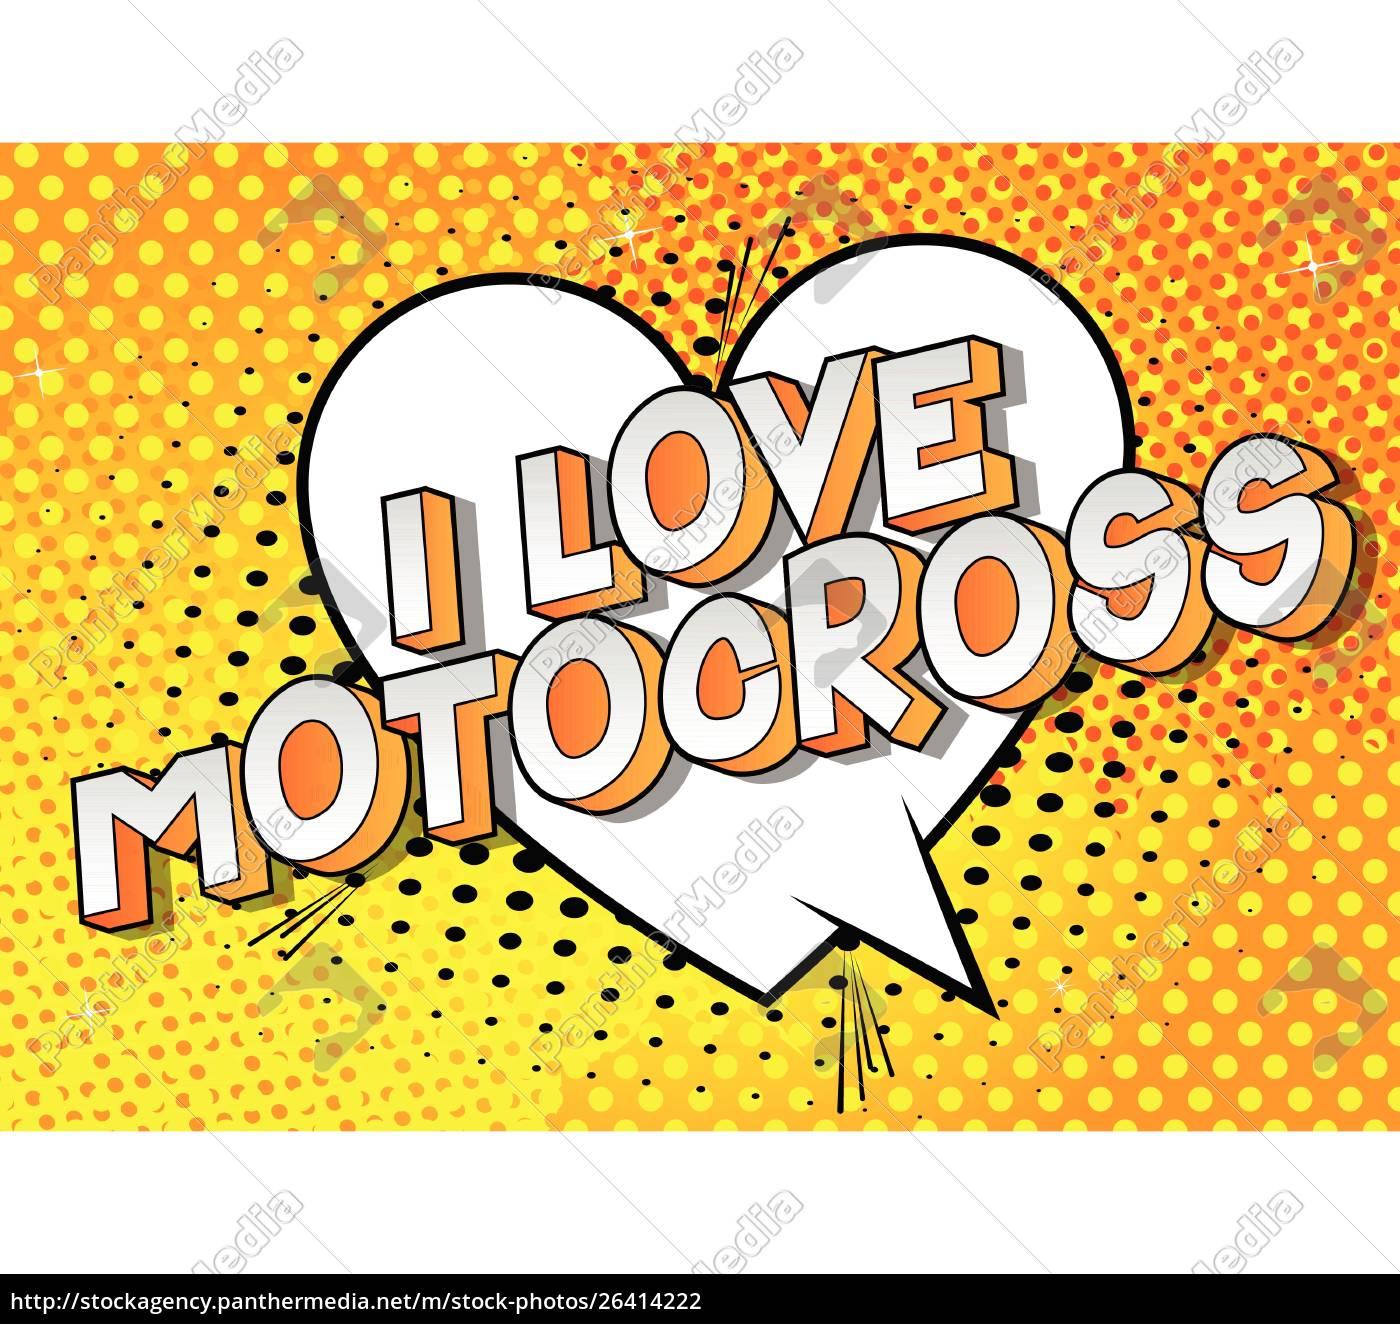 i, love, motocross-comic, book, style, words. - 26414222